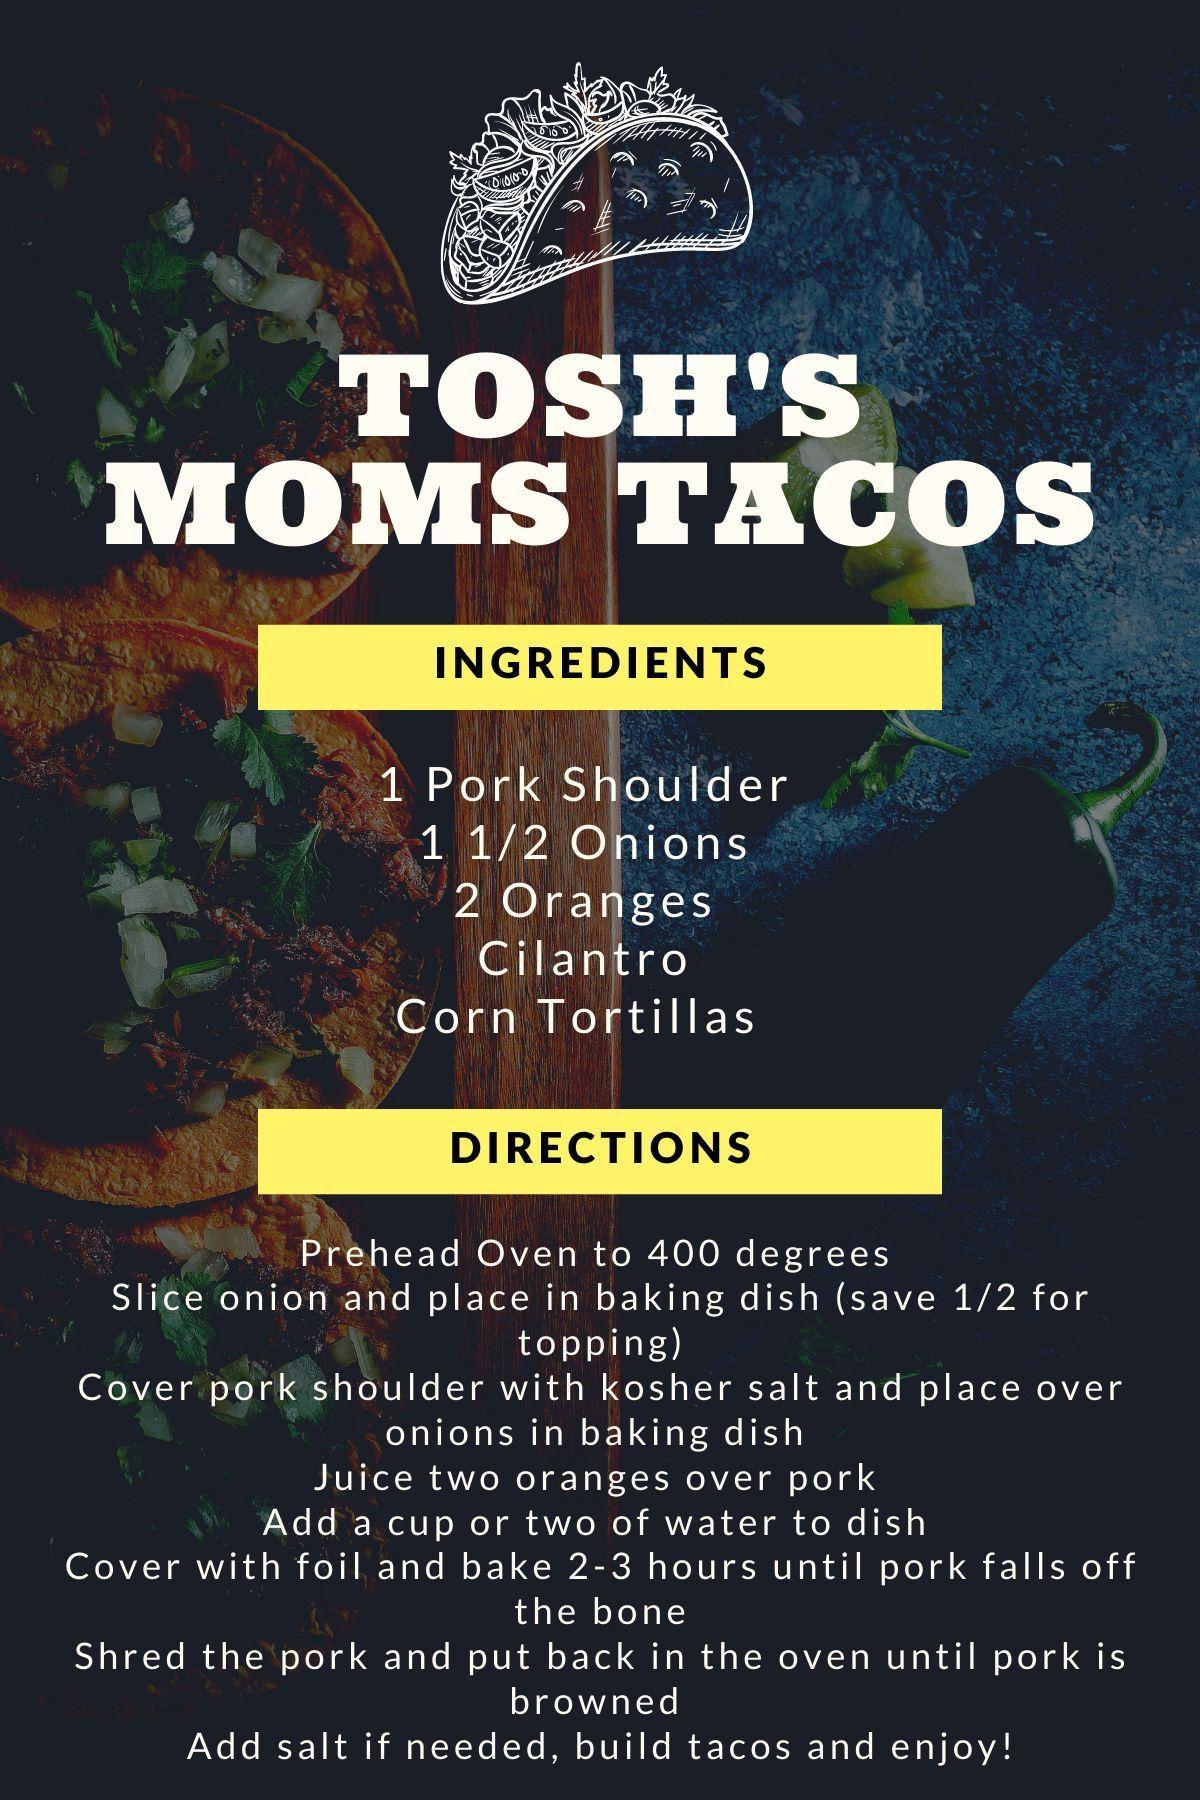 Tosh the Drummer's mom's taco recipe